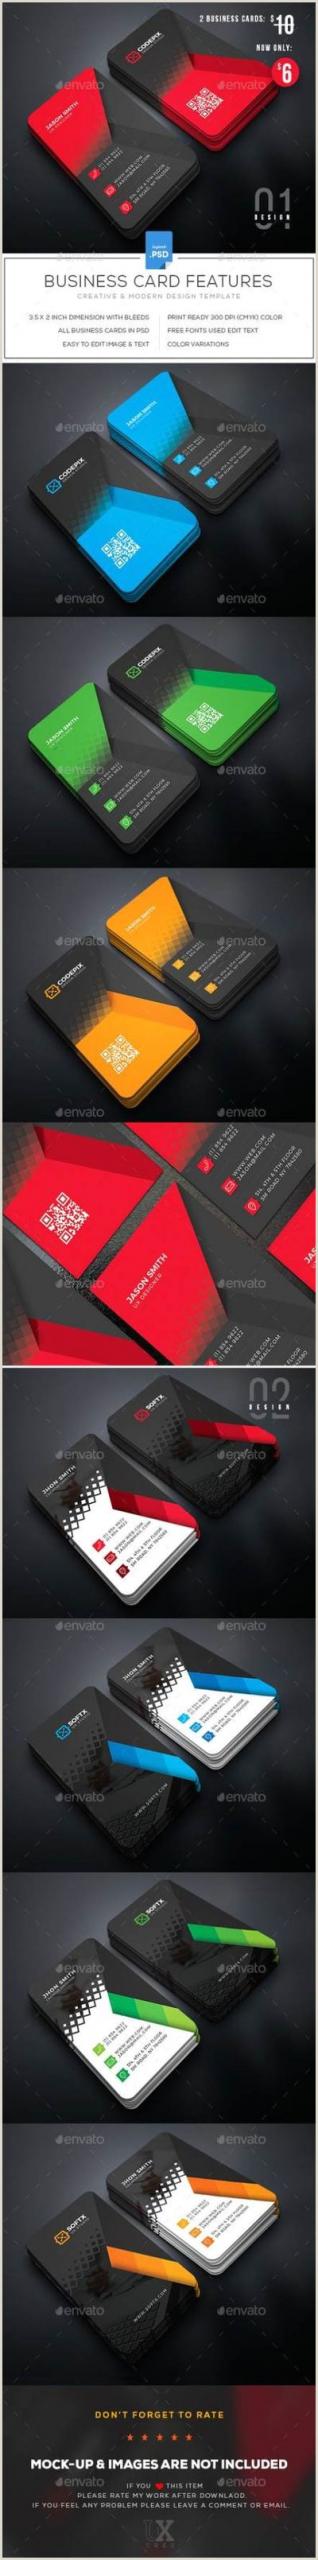 Visitcard Design Creative Modern Polygon Business Card